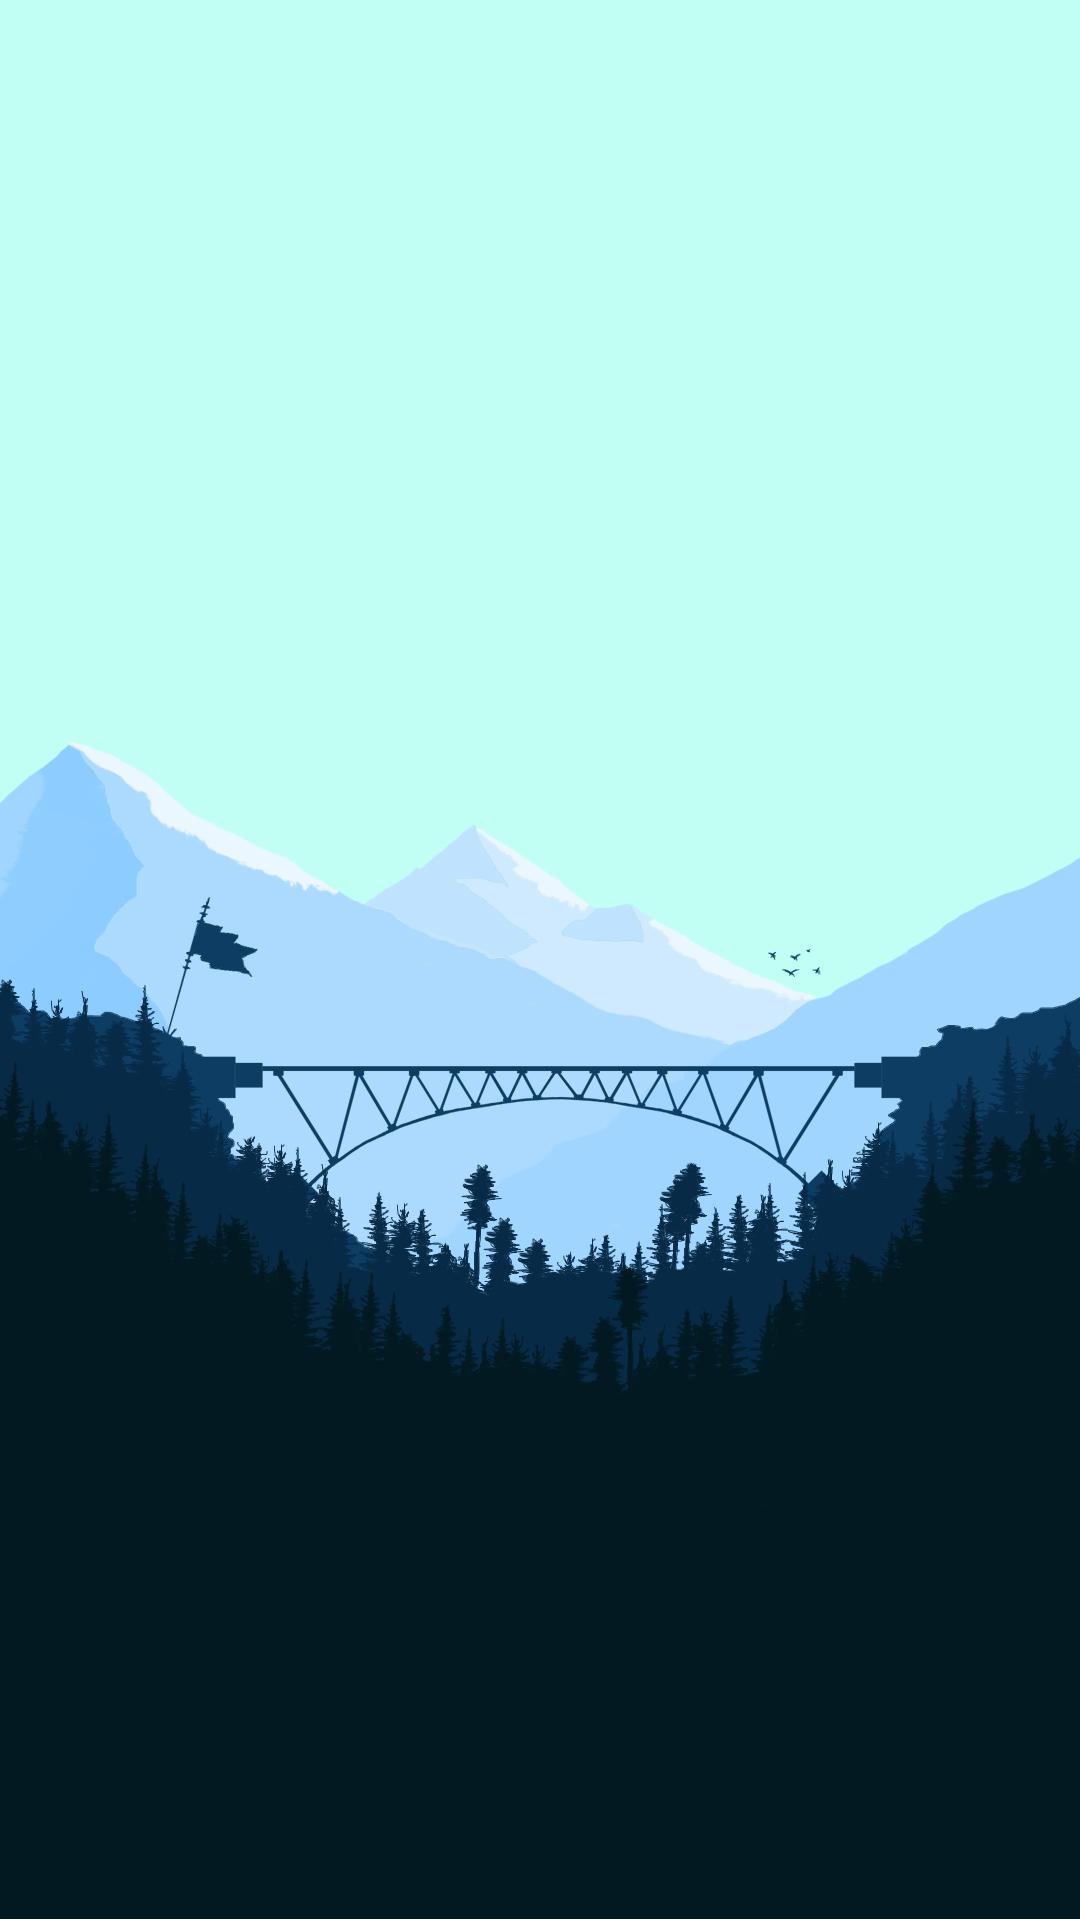 Minimal Bridge Digital Art Iphone Wallpaper Iphone